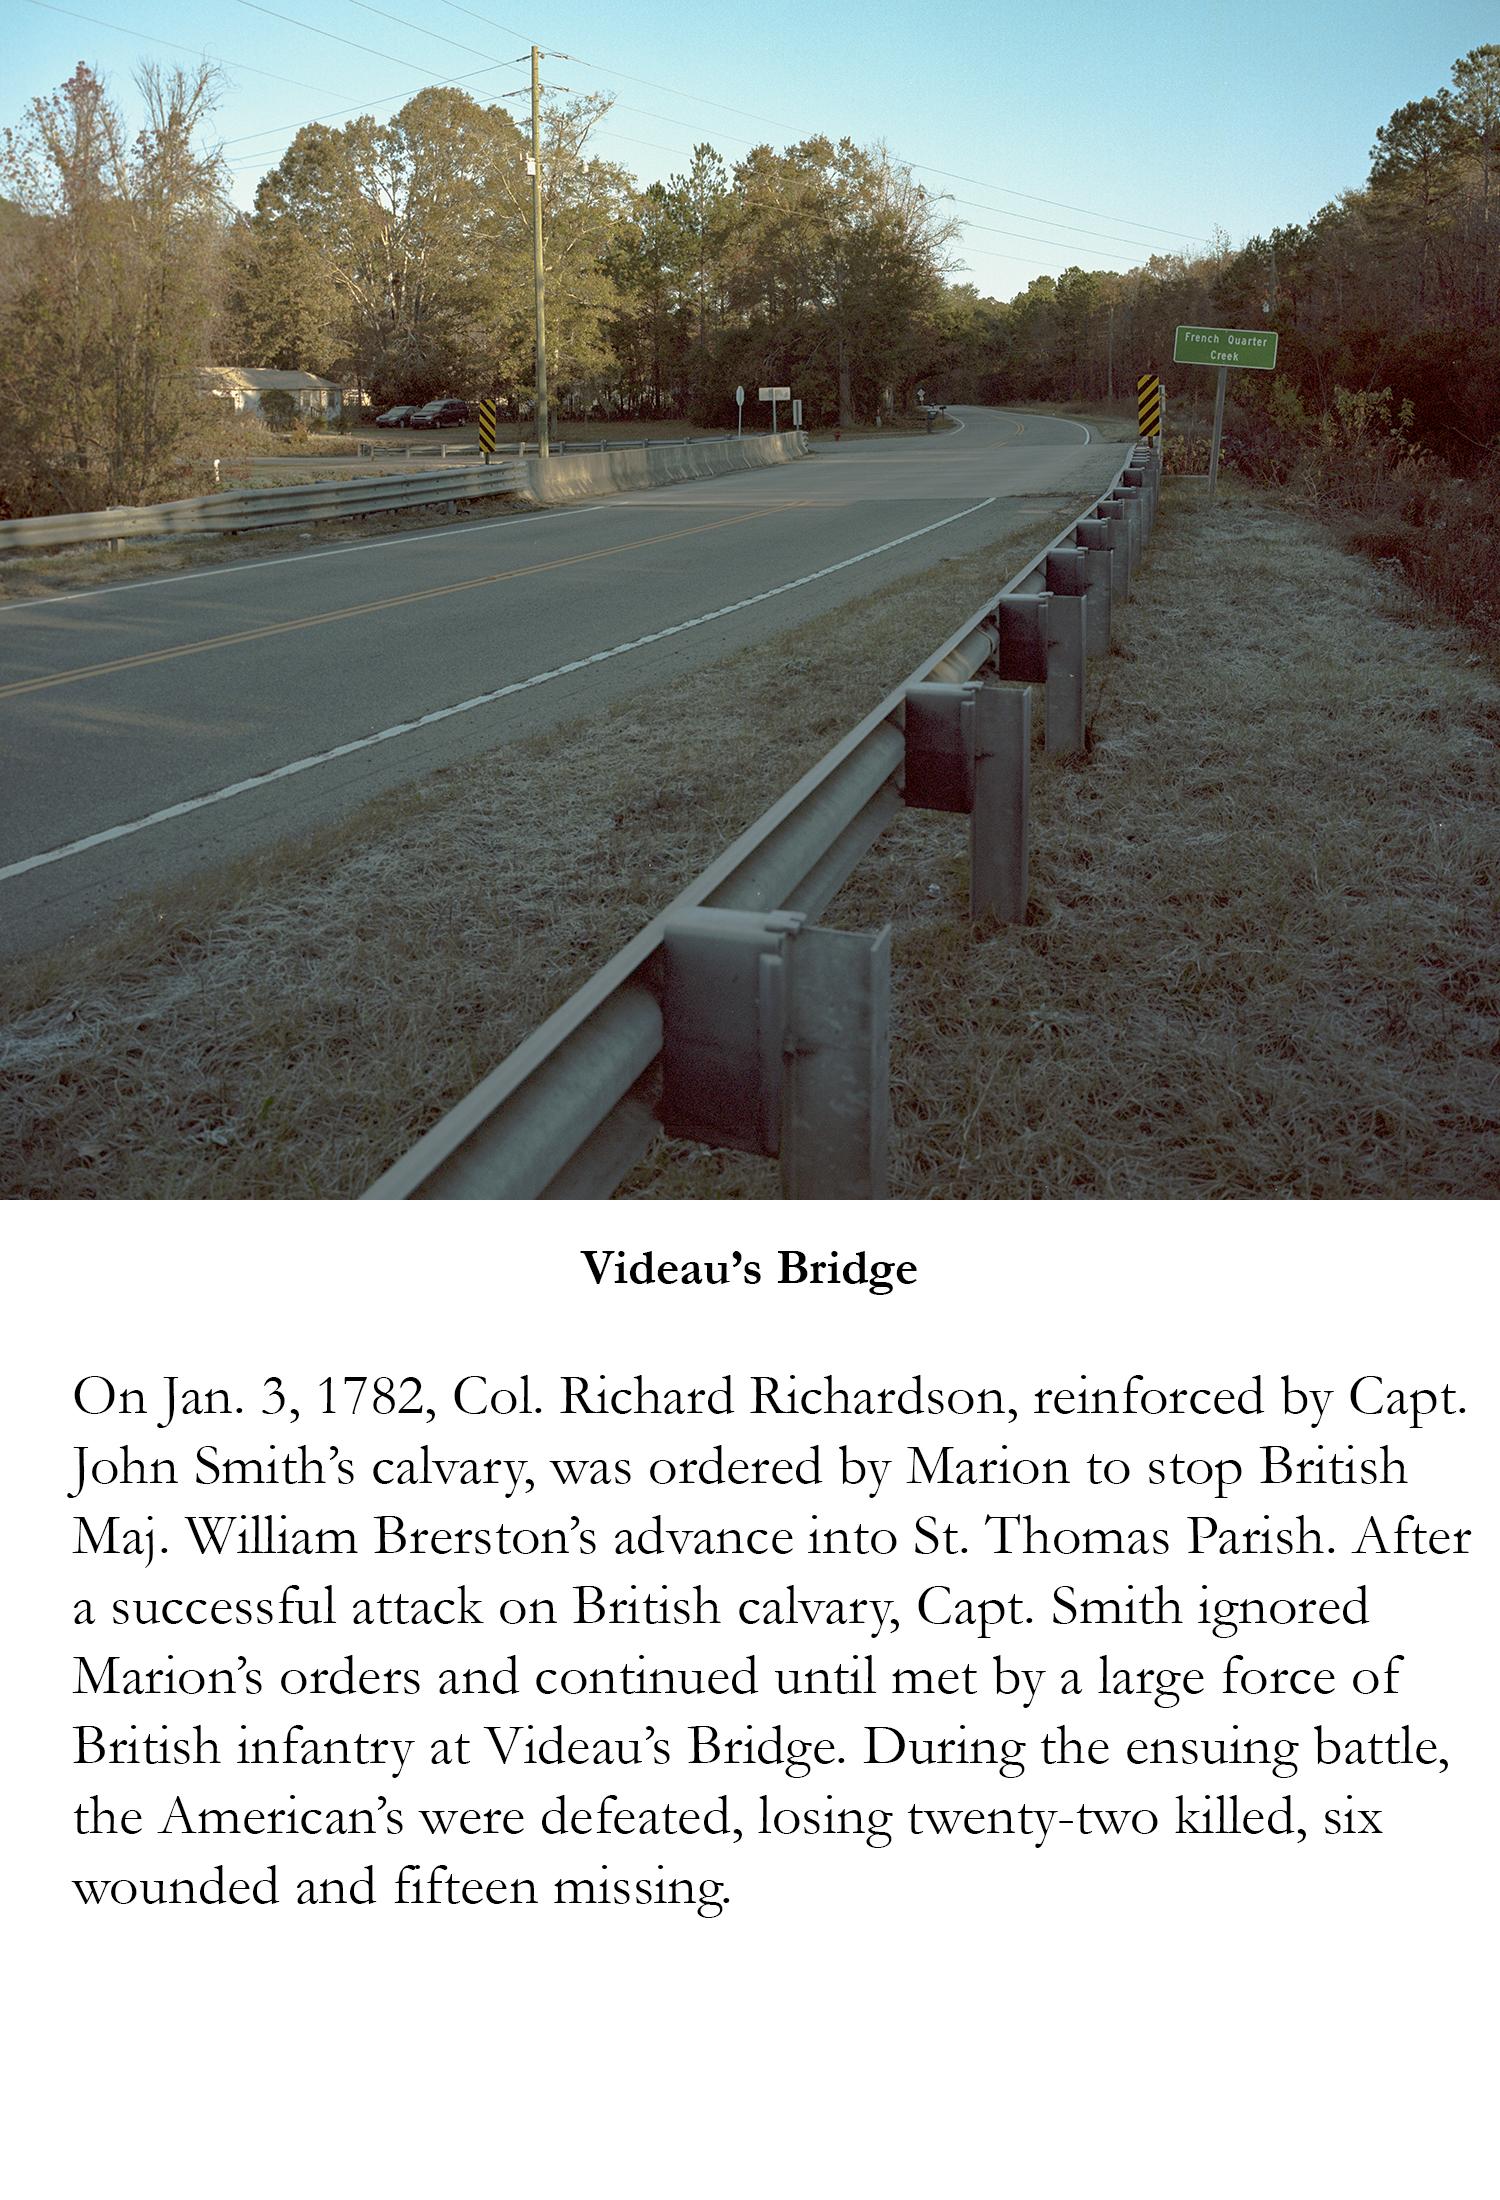 Videau's Bridge.jpg